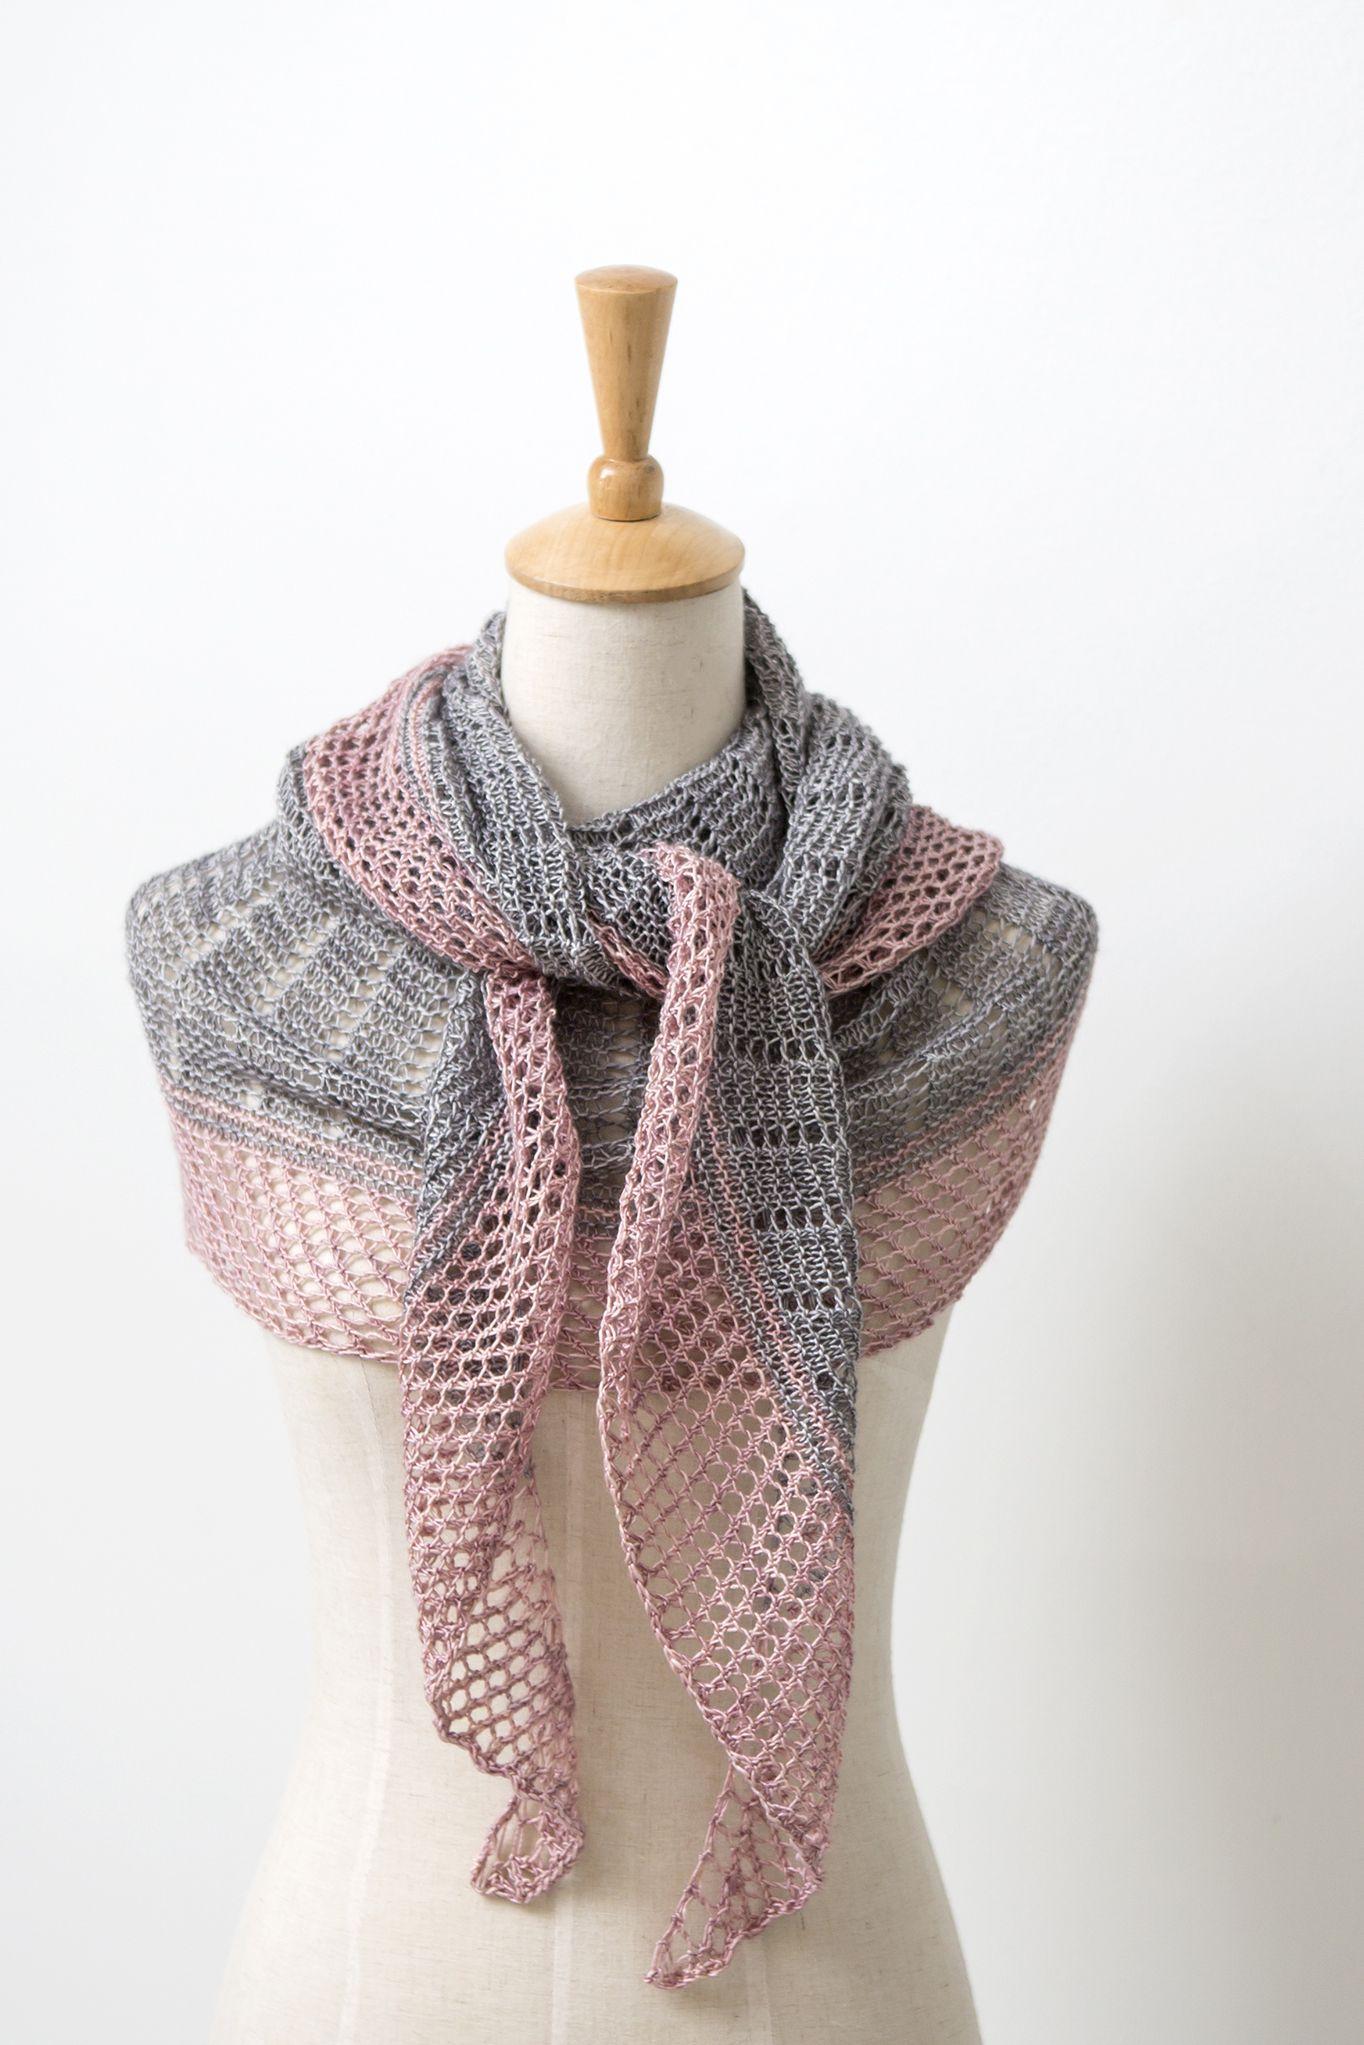 Lighthouse pattern by Janina Kallio | Knitting patterns ...